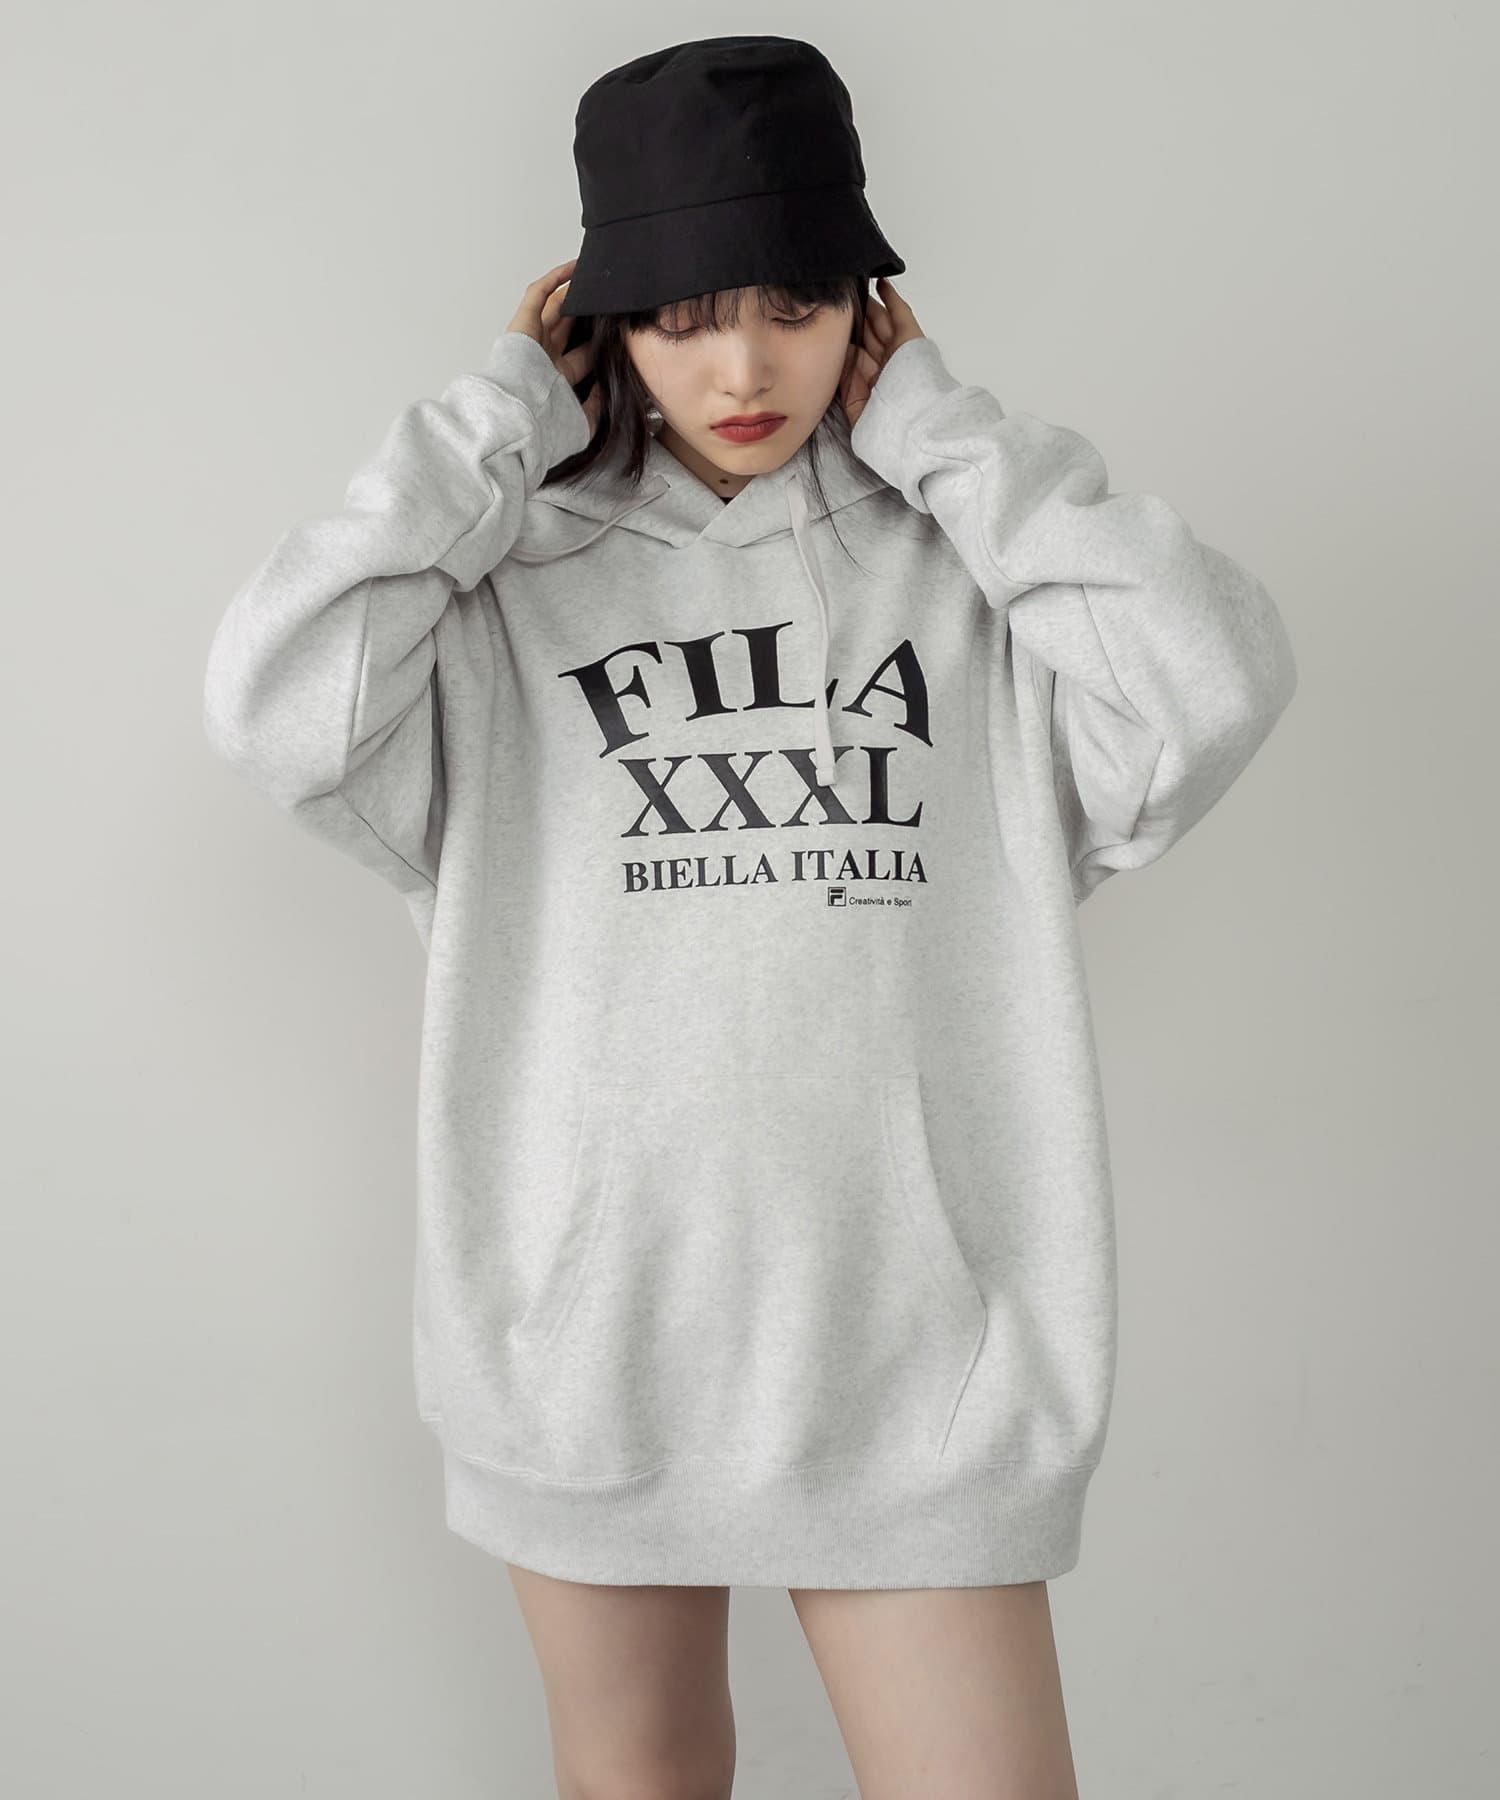 RASVOA(ラスボア) 【FILA】Pull Over hoodie